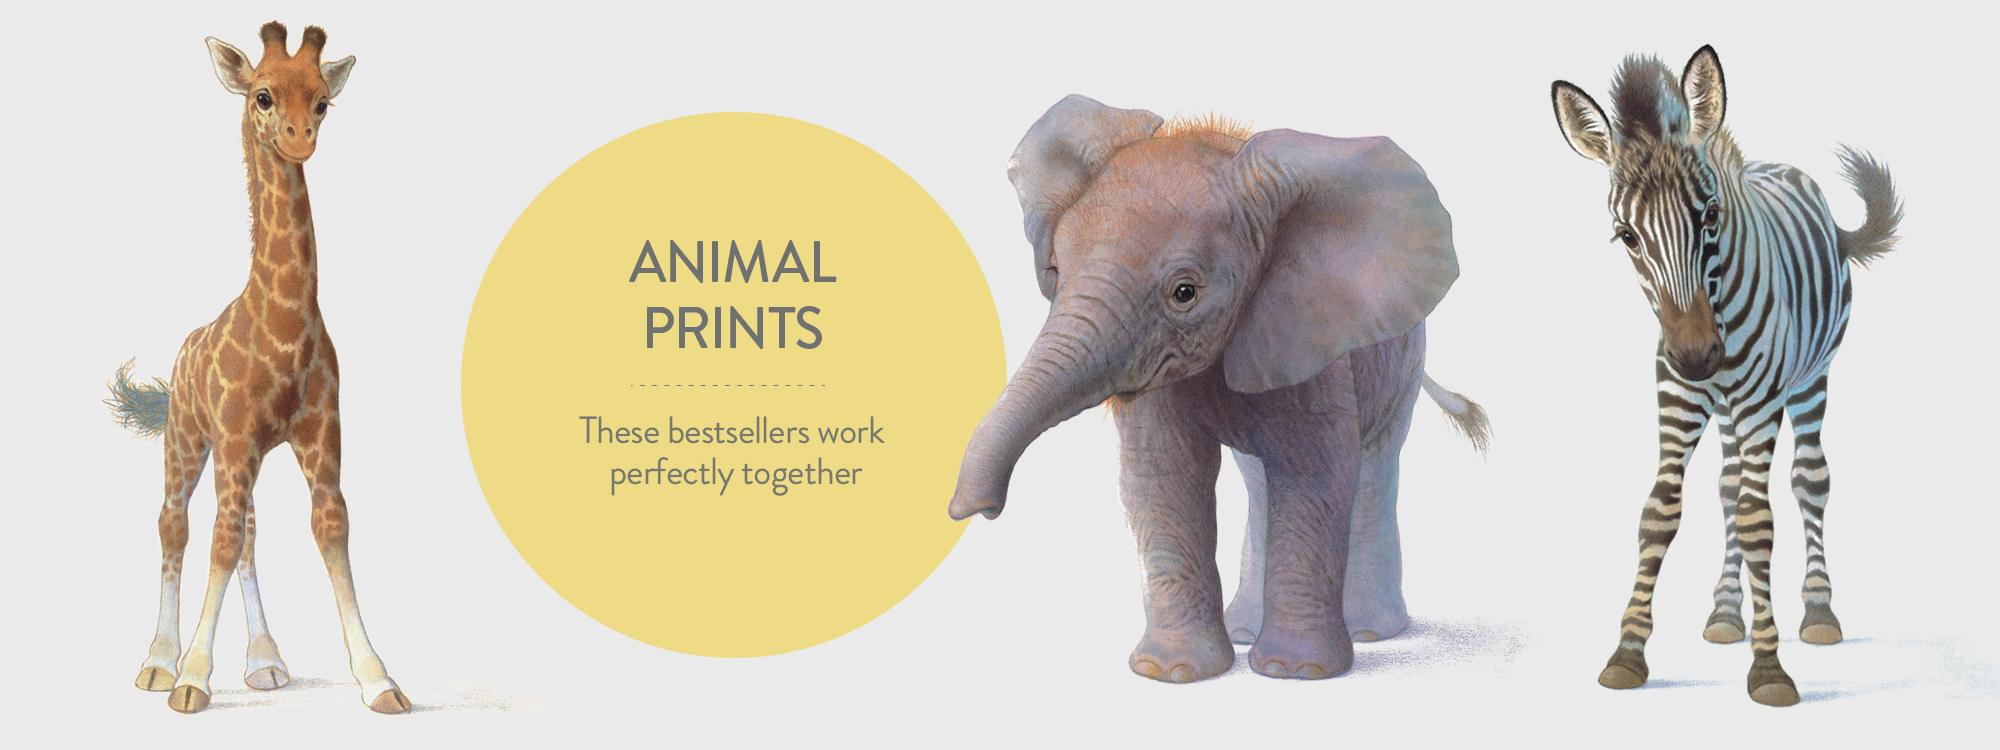 LBZ_BANNER_animalprintsArtboard 2.jpg